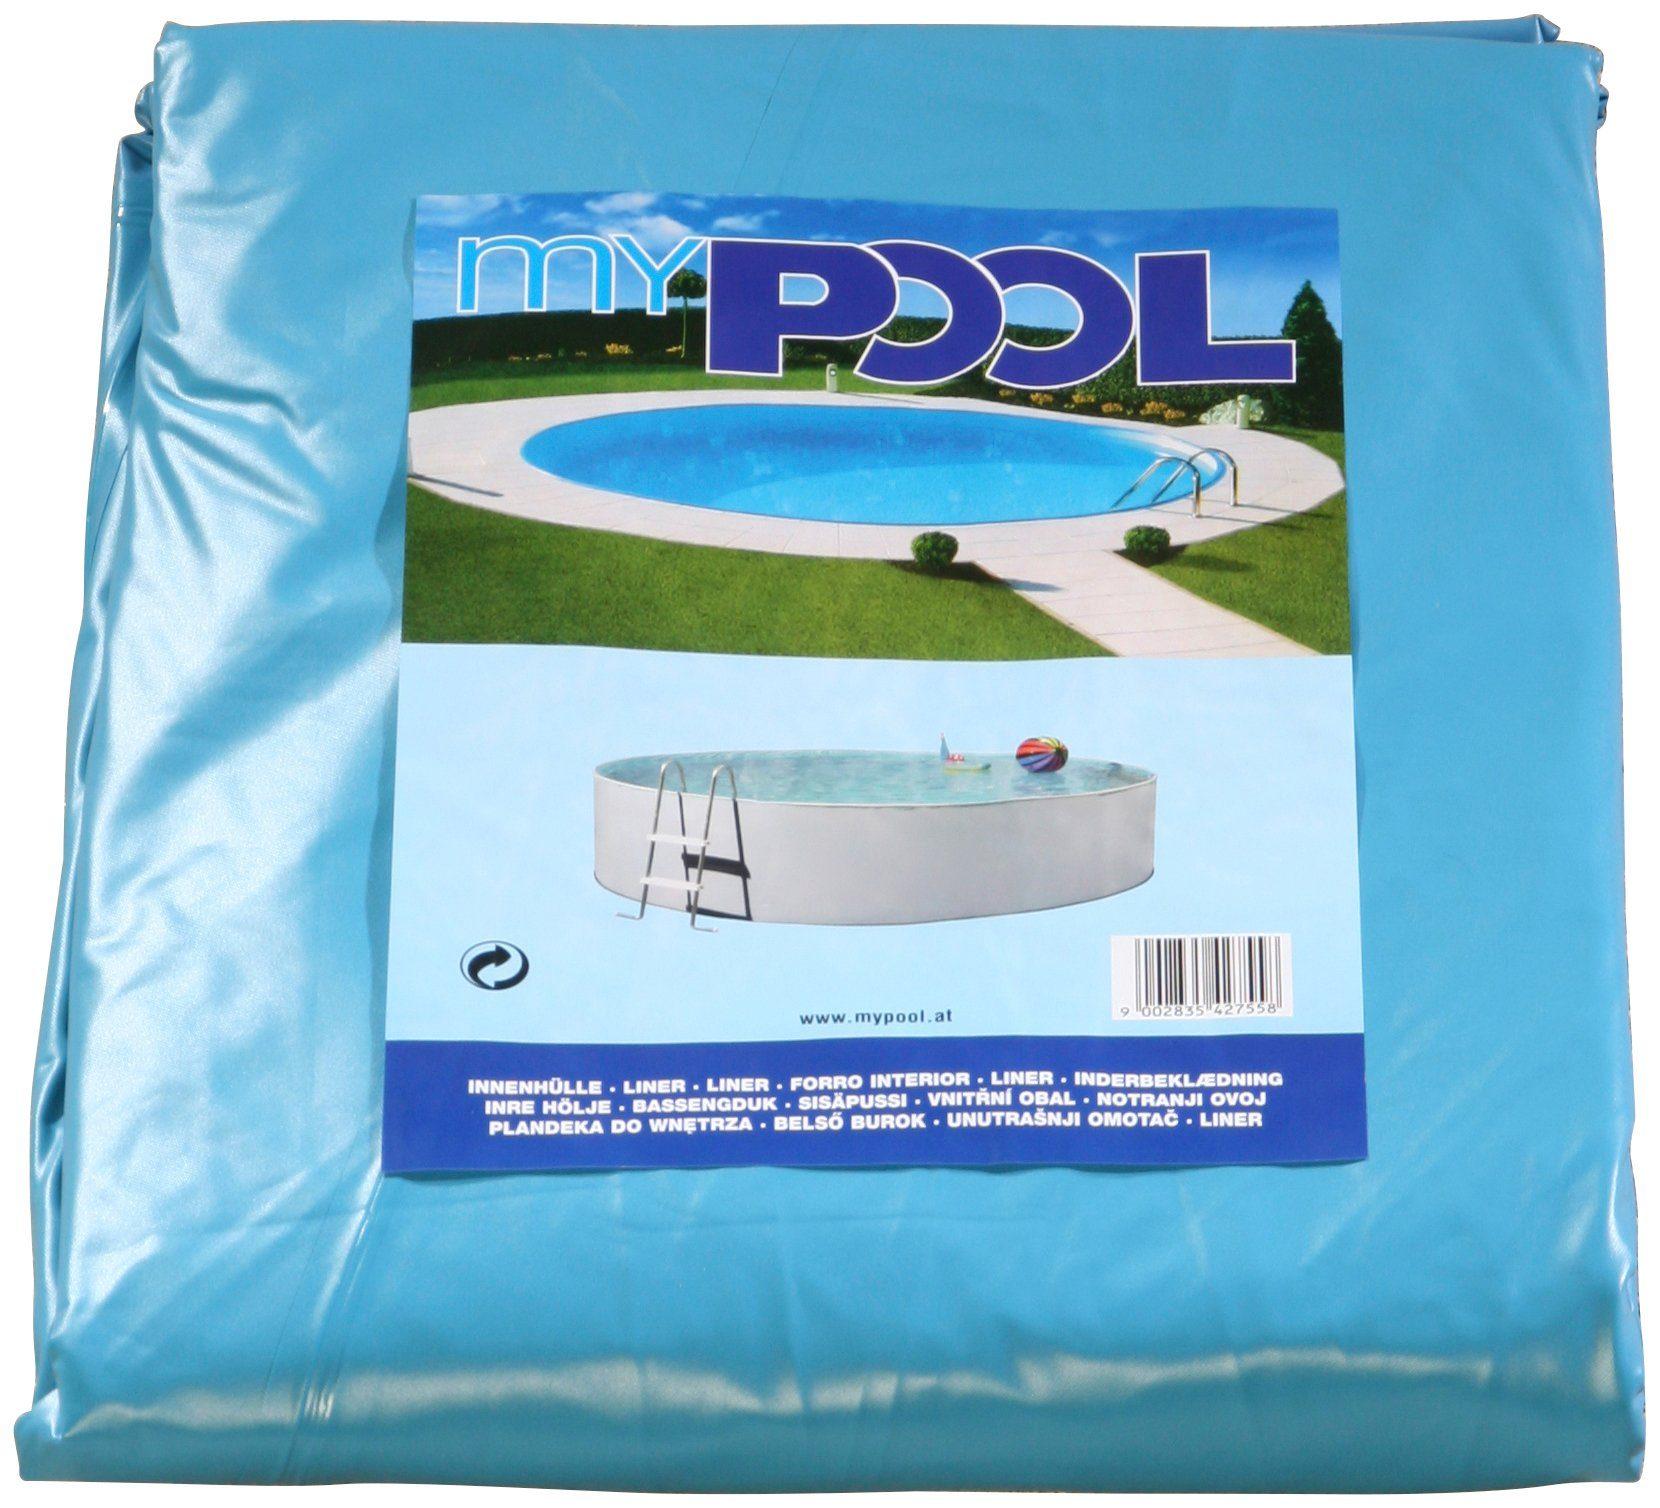 MYPOOL Pool-Innenhülle , für ØxH: 400x120 cm, 0,6 mm, sand